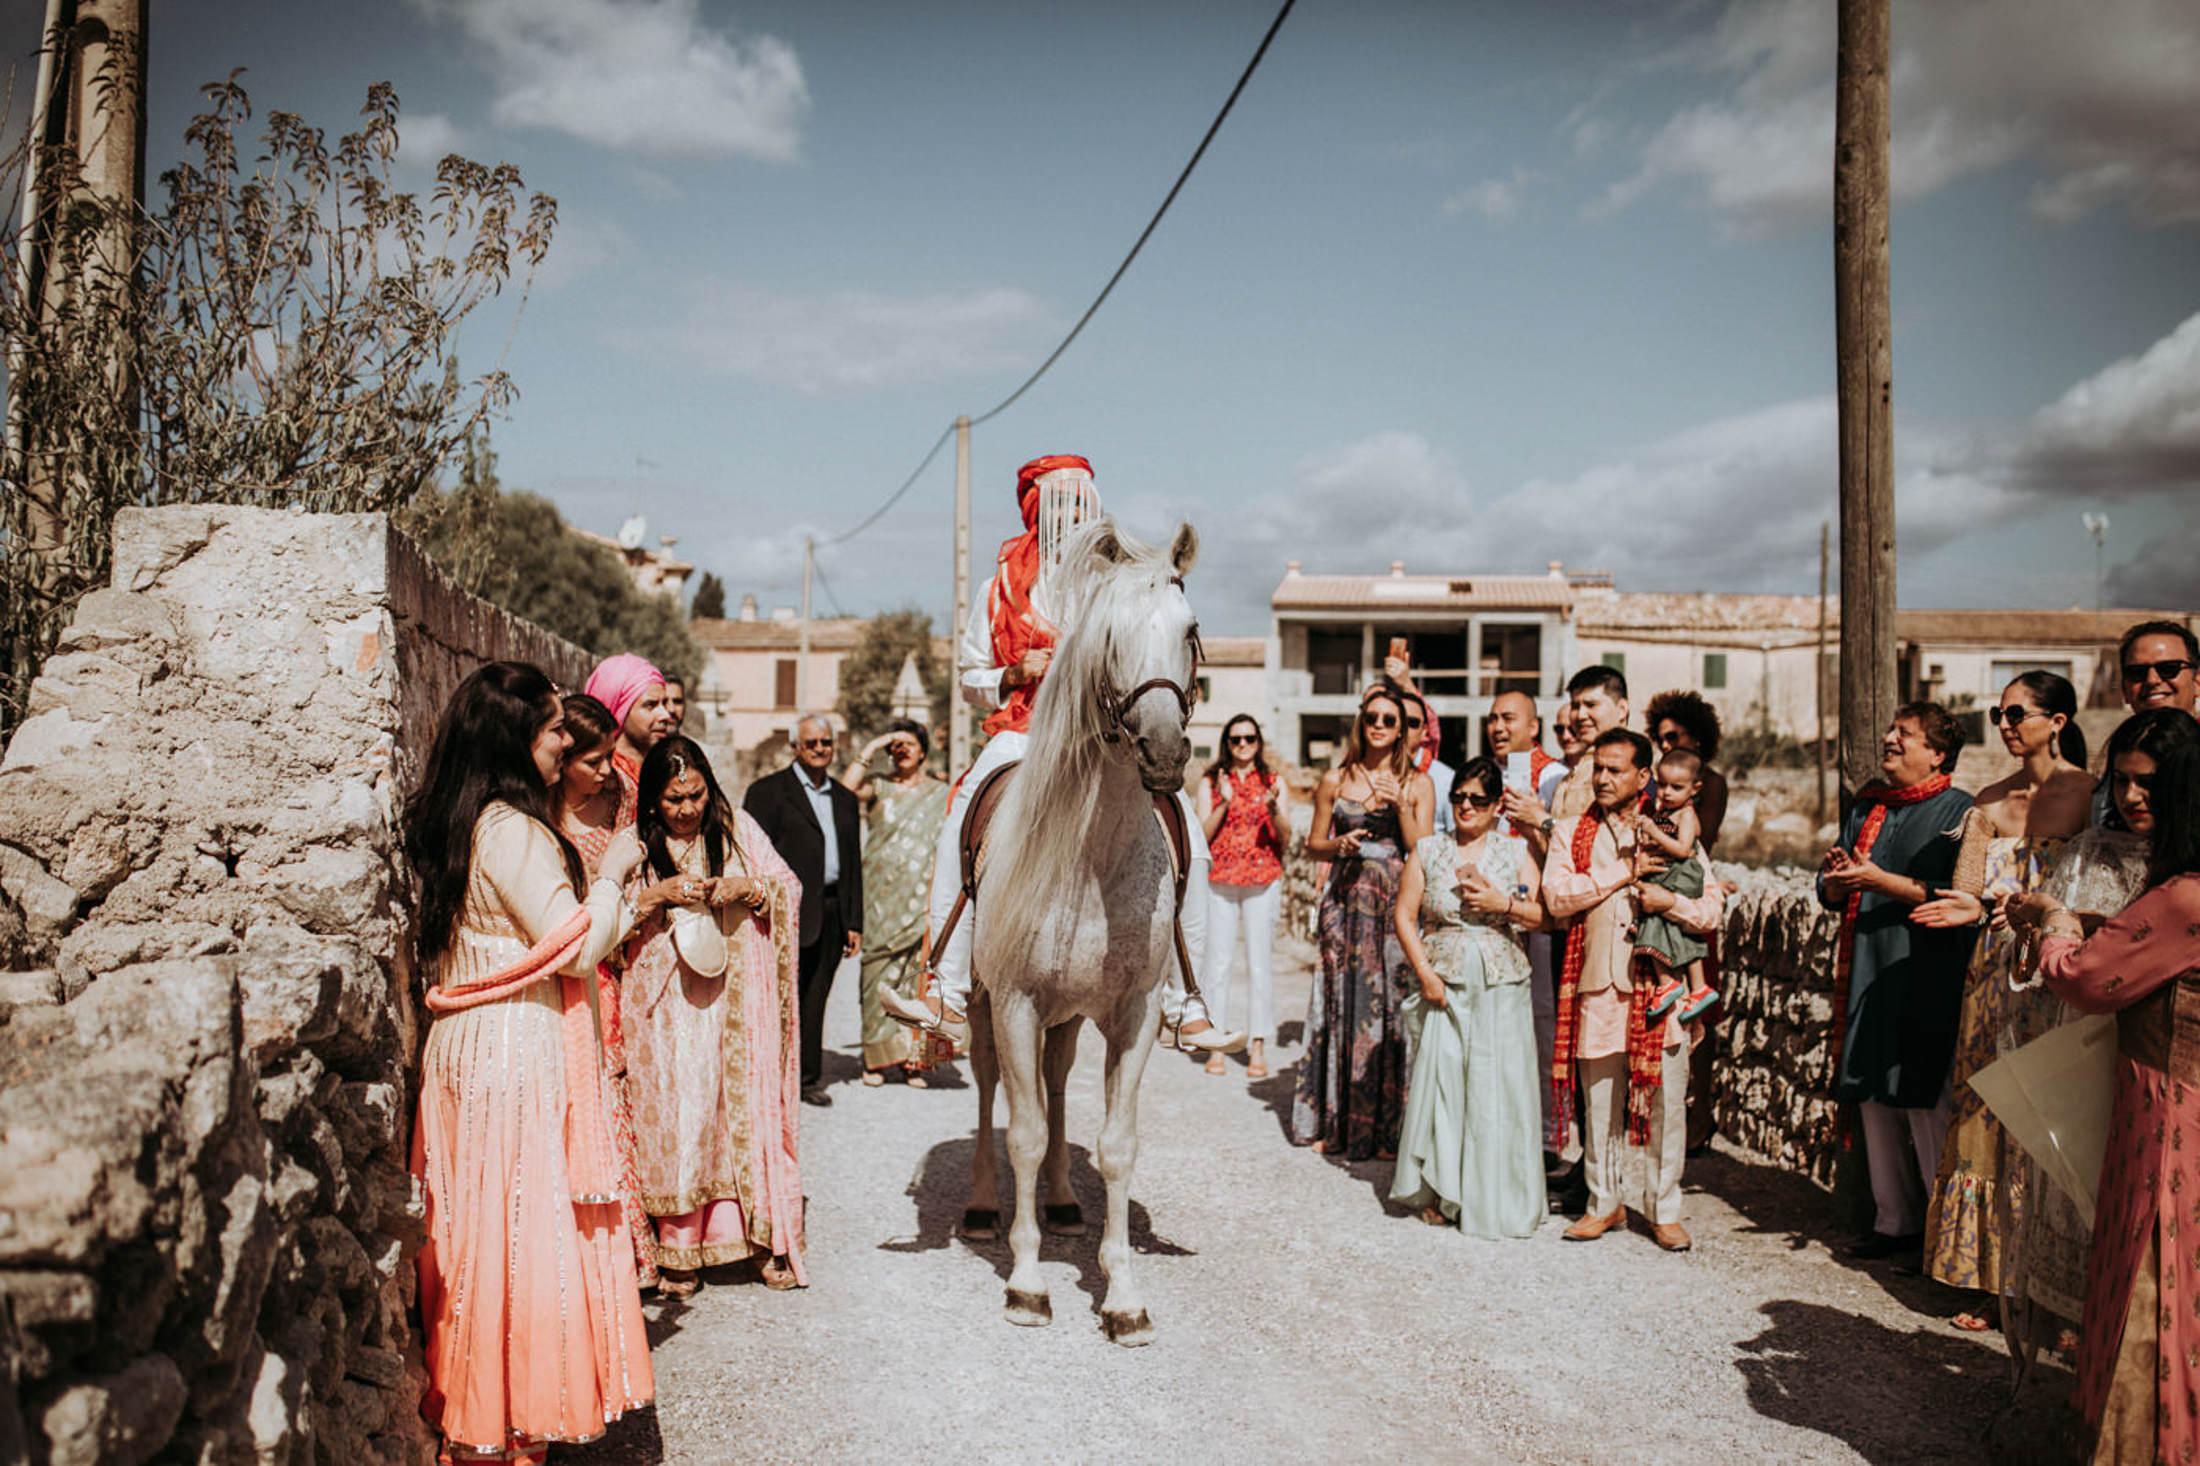 Wedding_Photographer_Mallorca_Daniela-Marquardt_Photography_New_York_Iceland_Tuscany_Santorini_Portugal_Austria_Bavaria_Elopement_Hochzeitsfotograf_AntjeRajat2_26